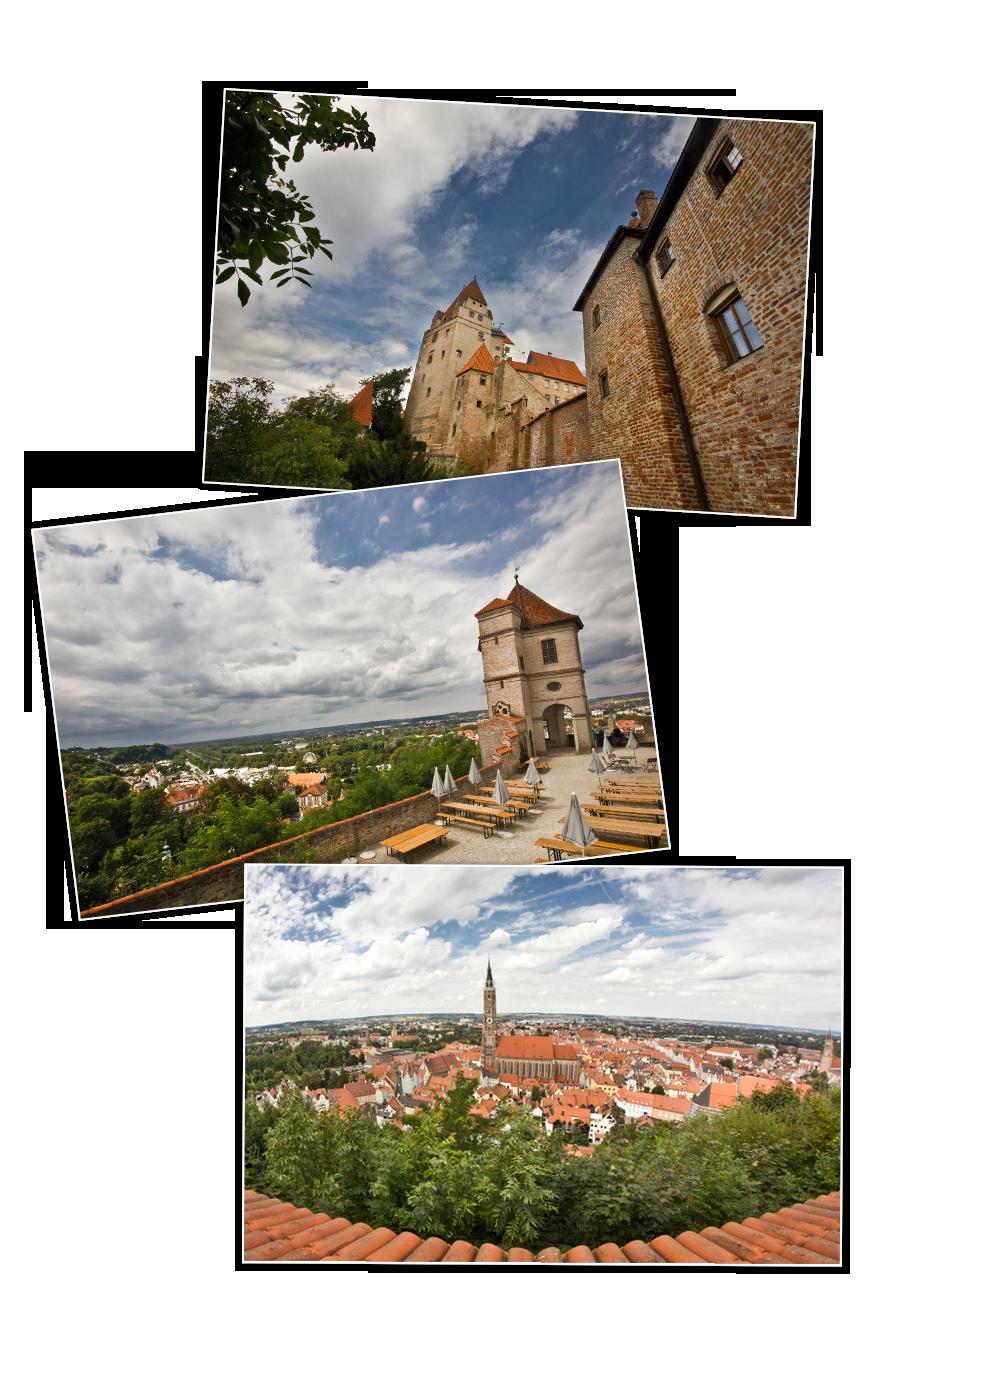 mep landshut_4_chateau